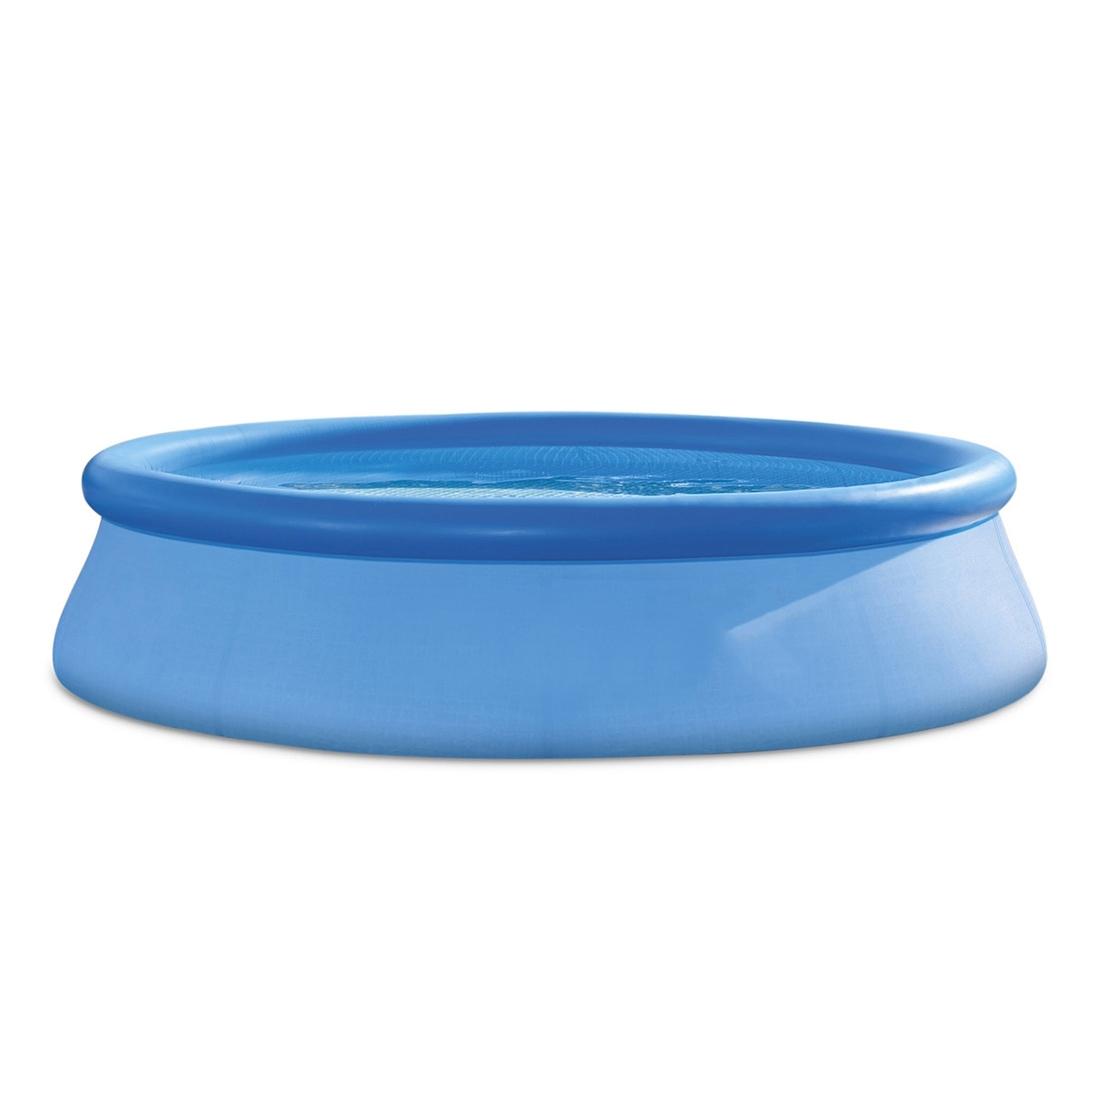 Marimex Tampa 3,05 × 0,76 m 10340273 Tampa bazén modrý bez filtrace